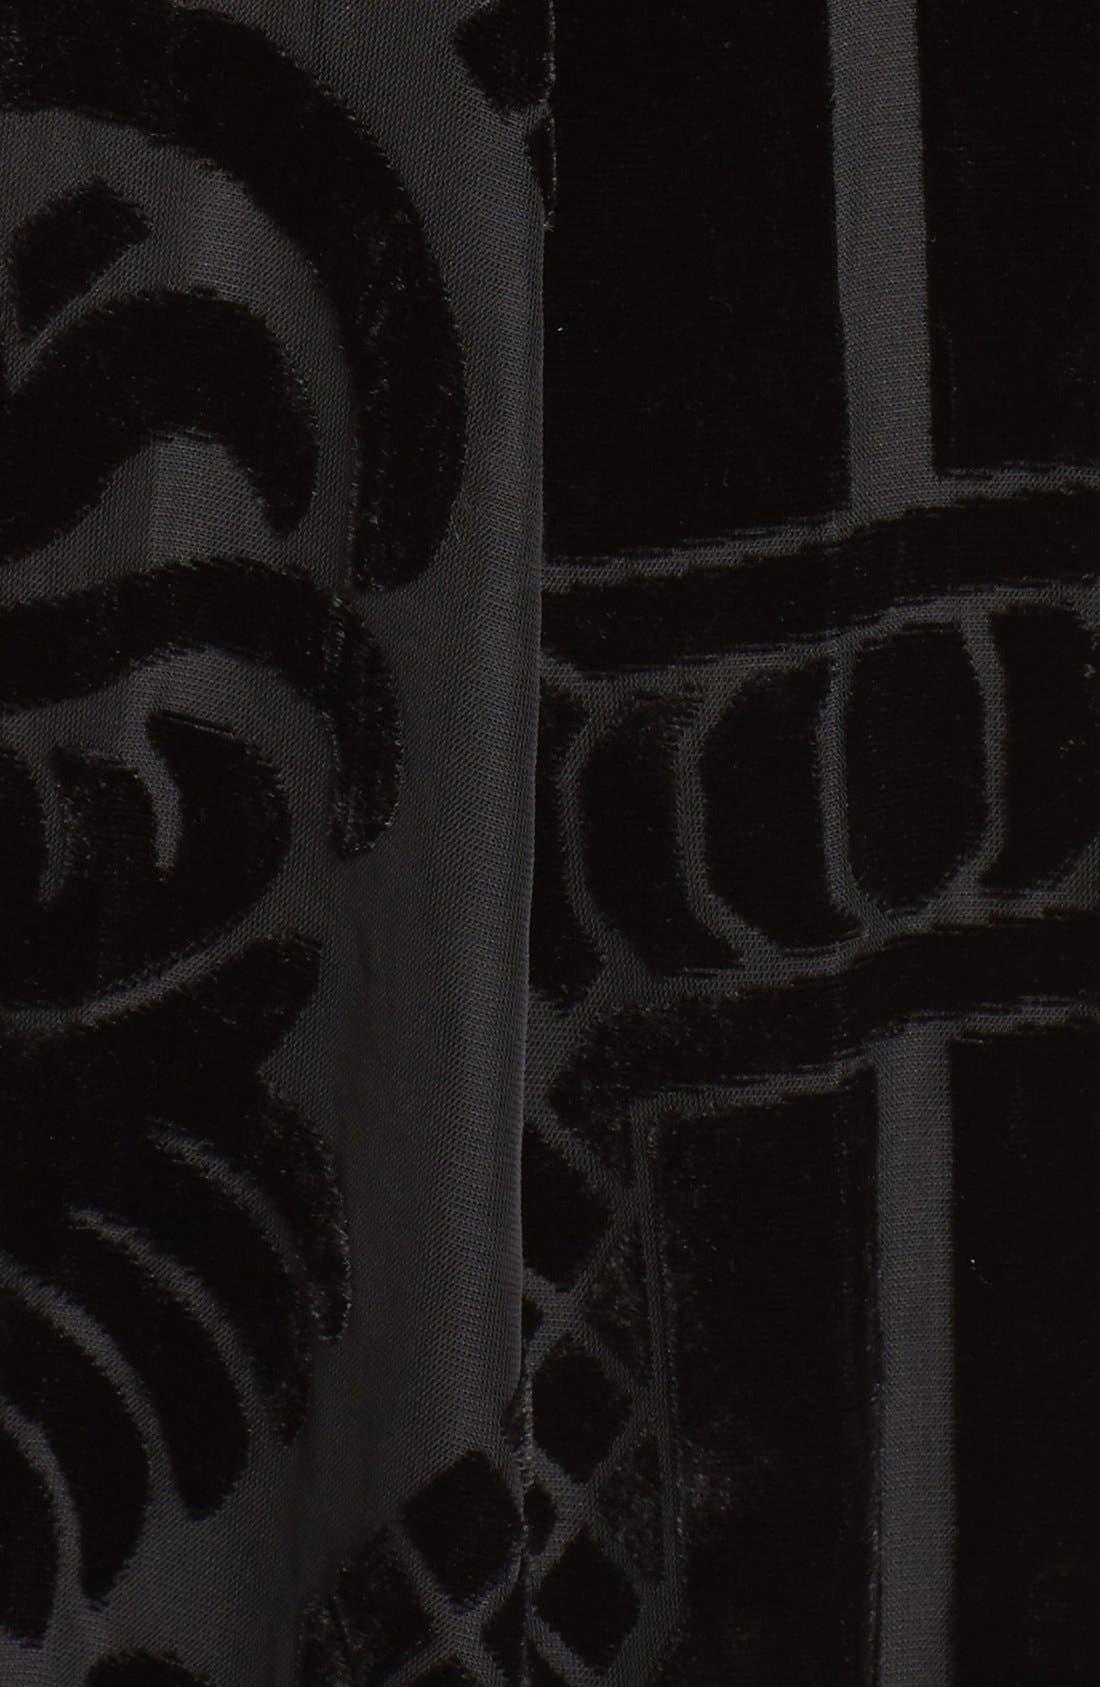 Burnout Velvet Fit & Flare Dress,                             Alternate thumbnail 6, color,                             001